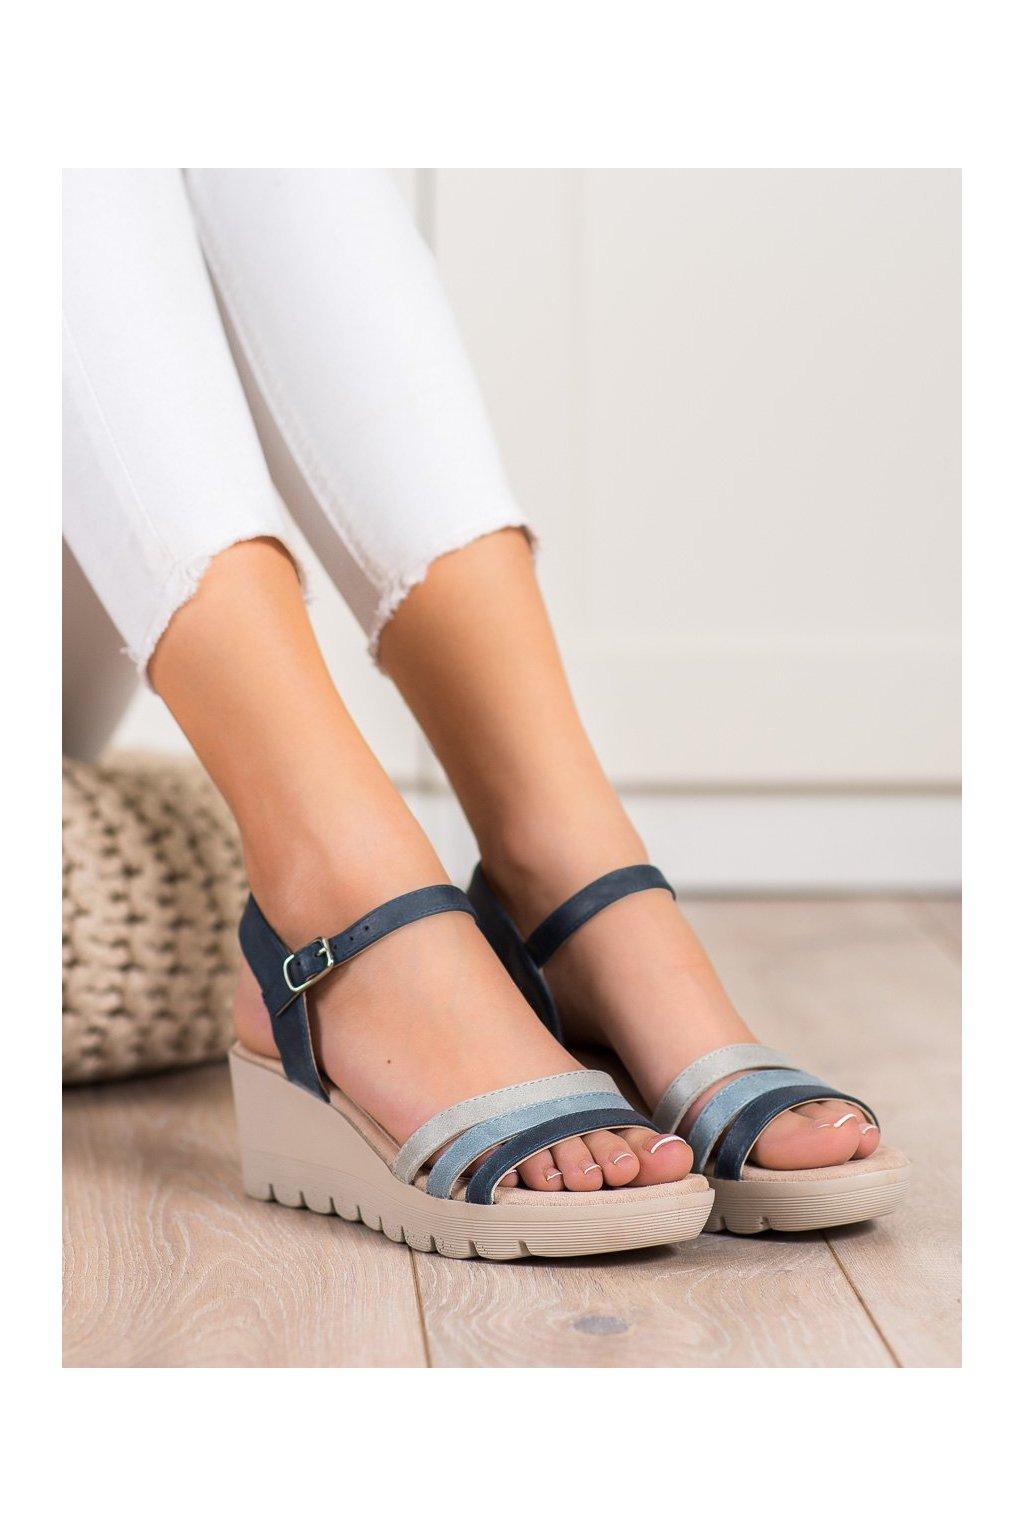 Modré sandále Kylie kod K2011302MA